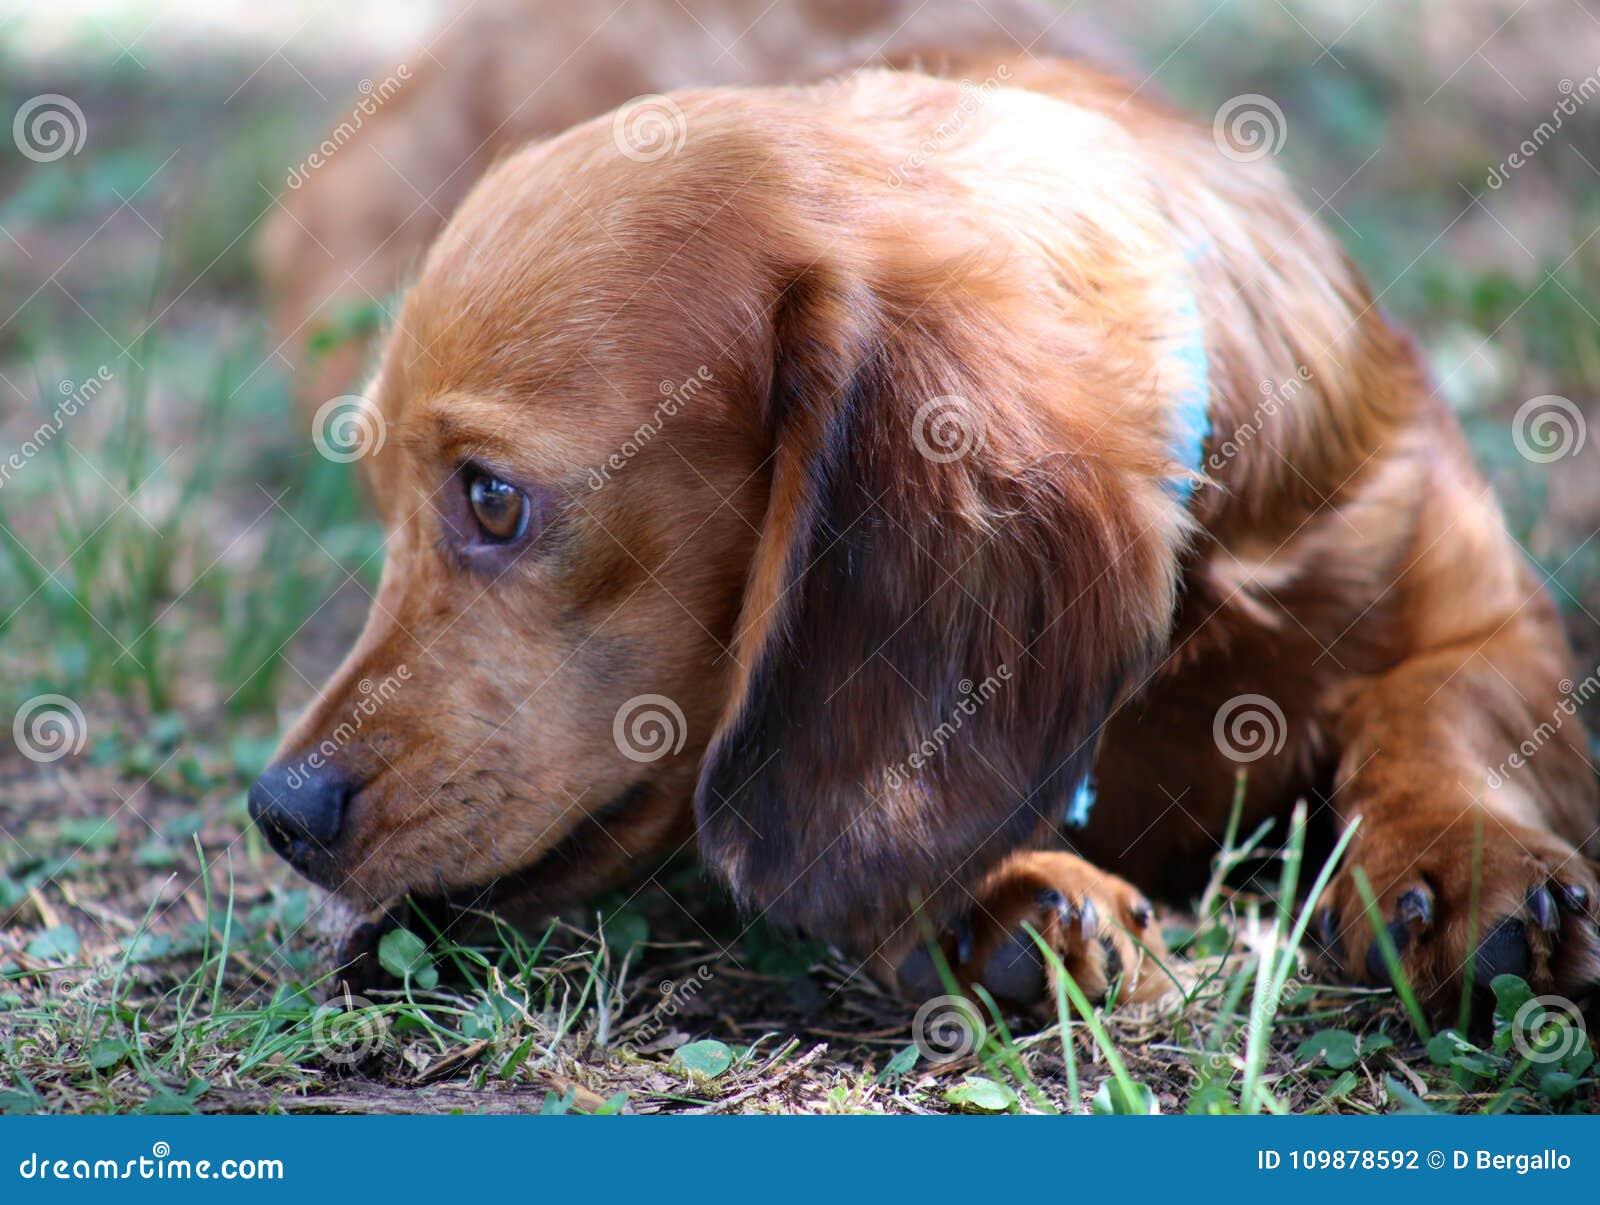 Cute little Dachshund wiener dog beautiful puppy